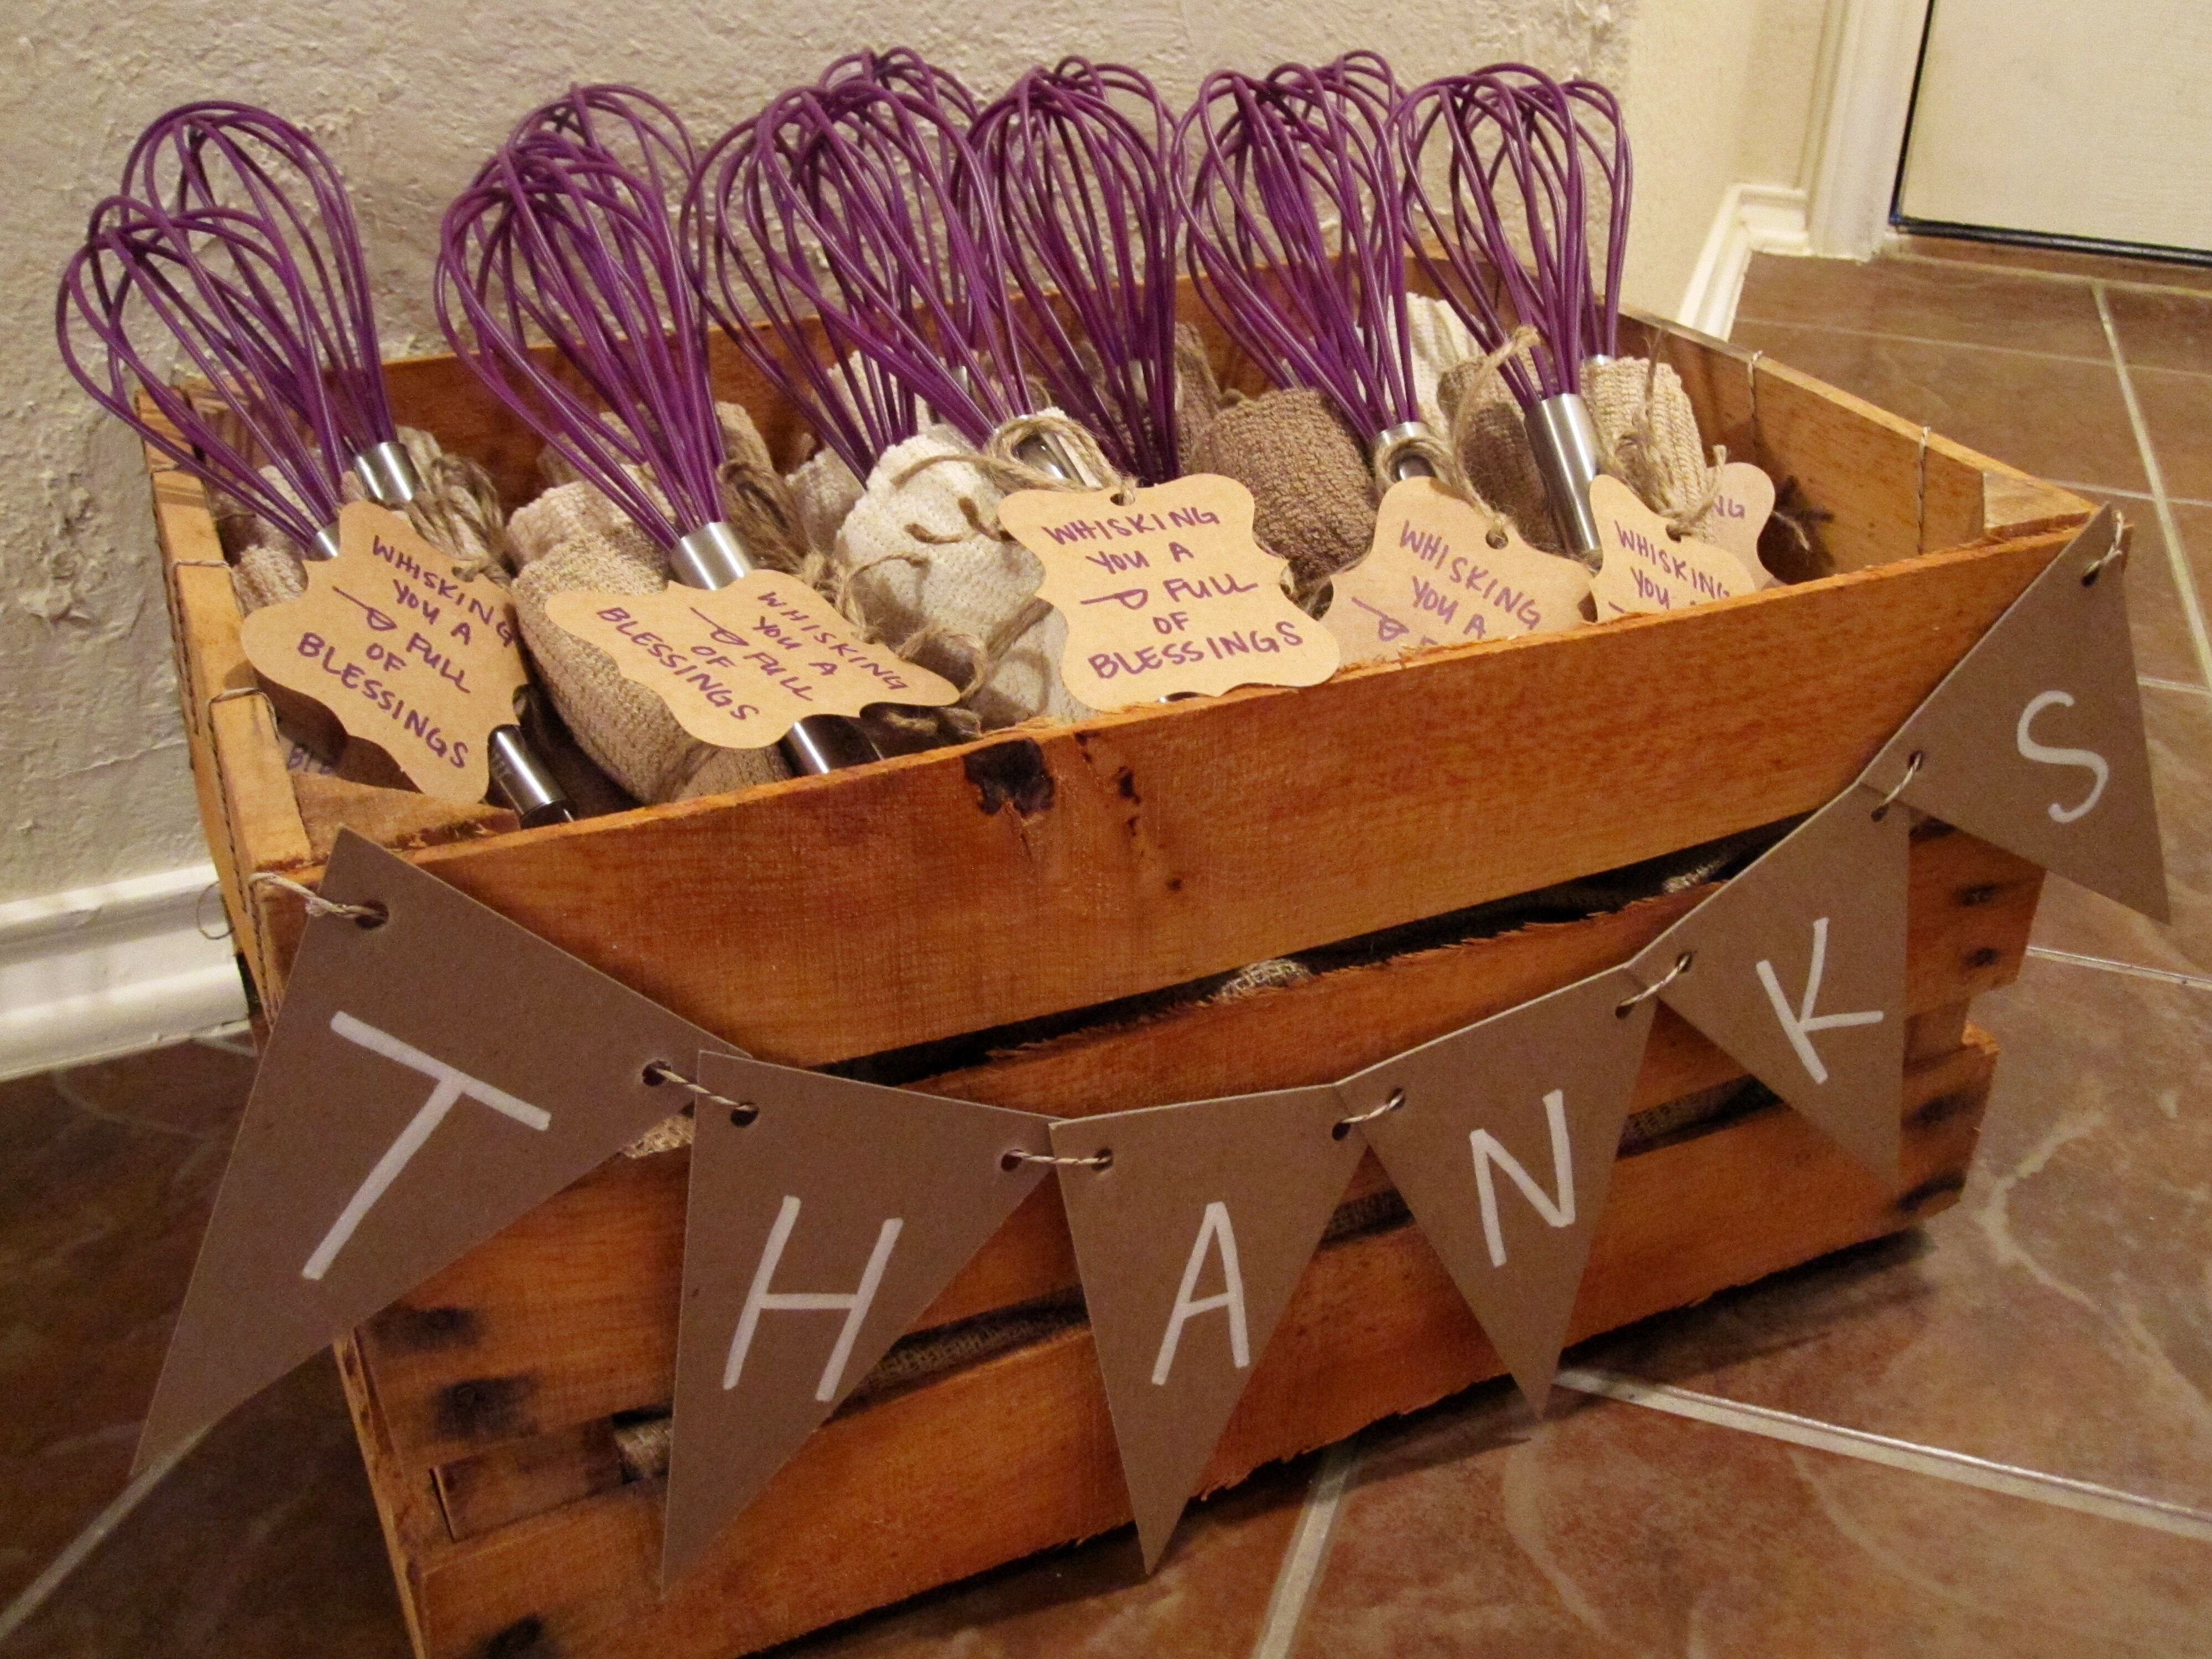 10 Famous Bridal Shower Hostess Gift Ideas hostess gift for bridal shower showers pinterest bridal 1 2020